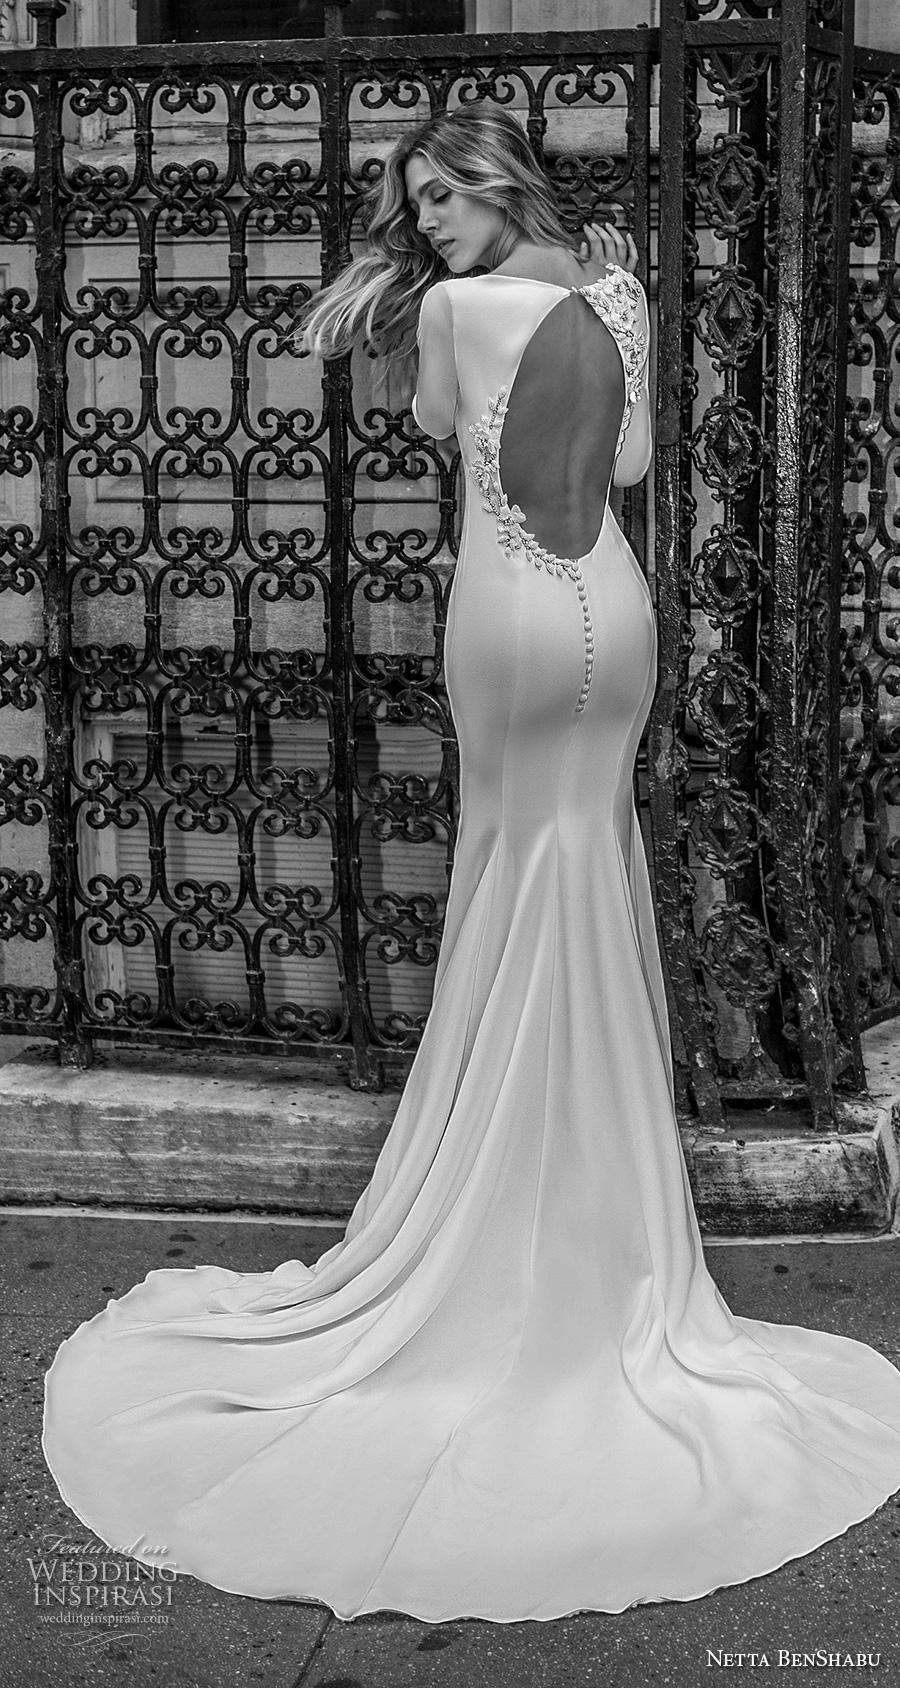 netta benshabu fall 2019 bridal long sleeves bateau neckline simple minimalist clean elegant fit and flare wedding dress low backless open back chapel train (13) bv